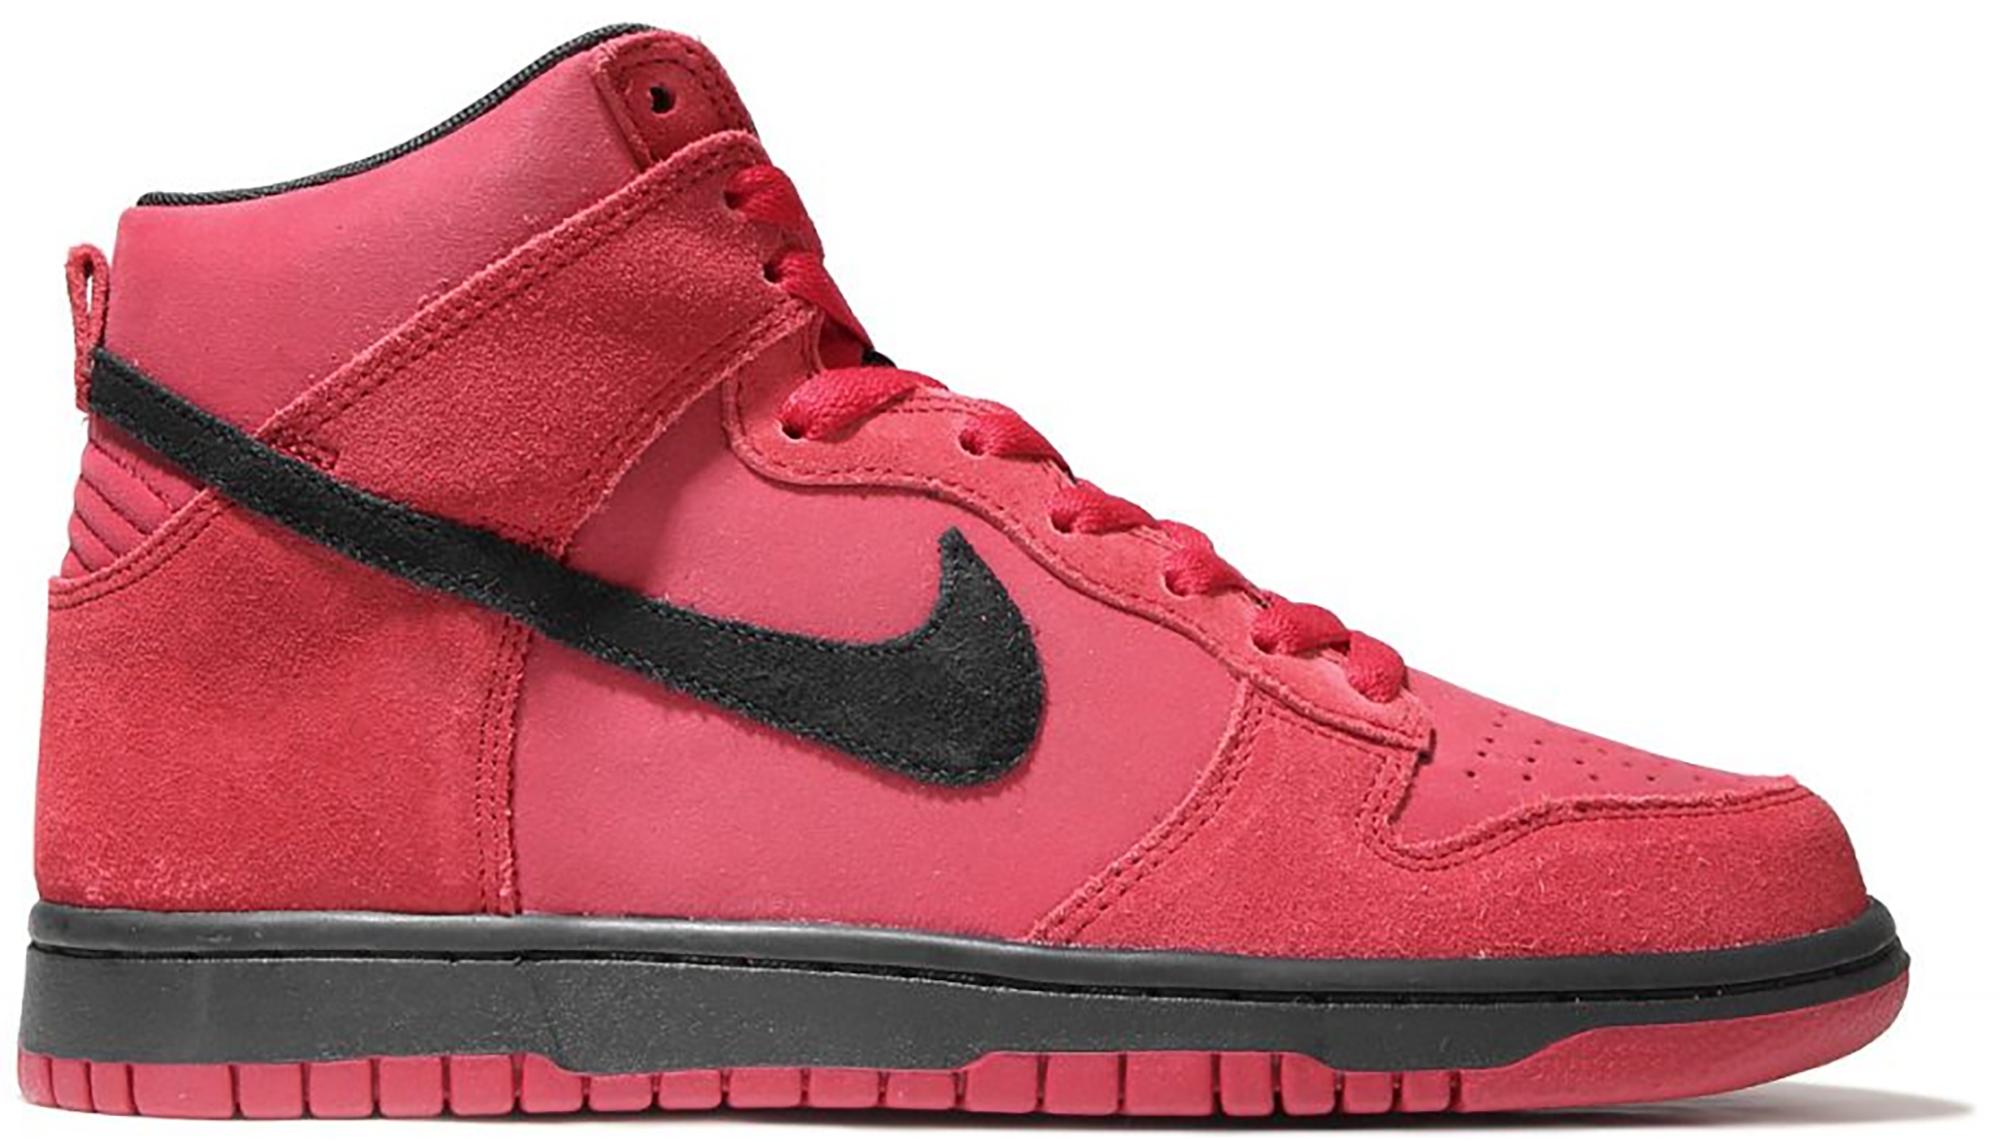 Nike Dunk High Gym Red Black - 904233-600